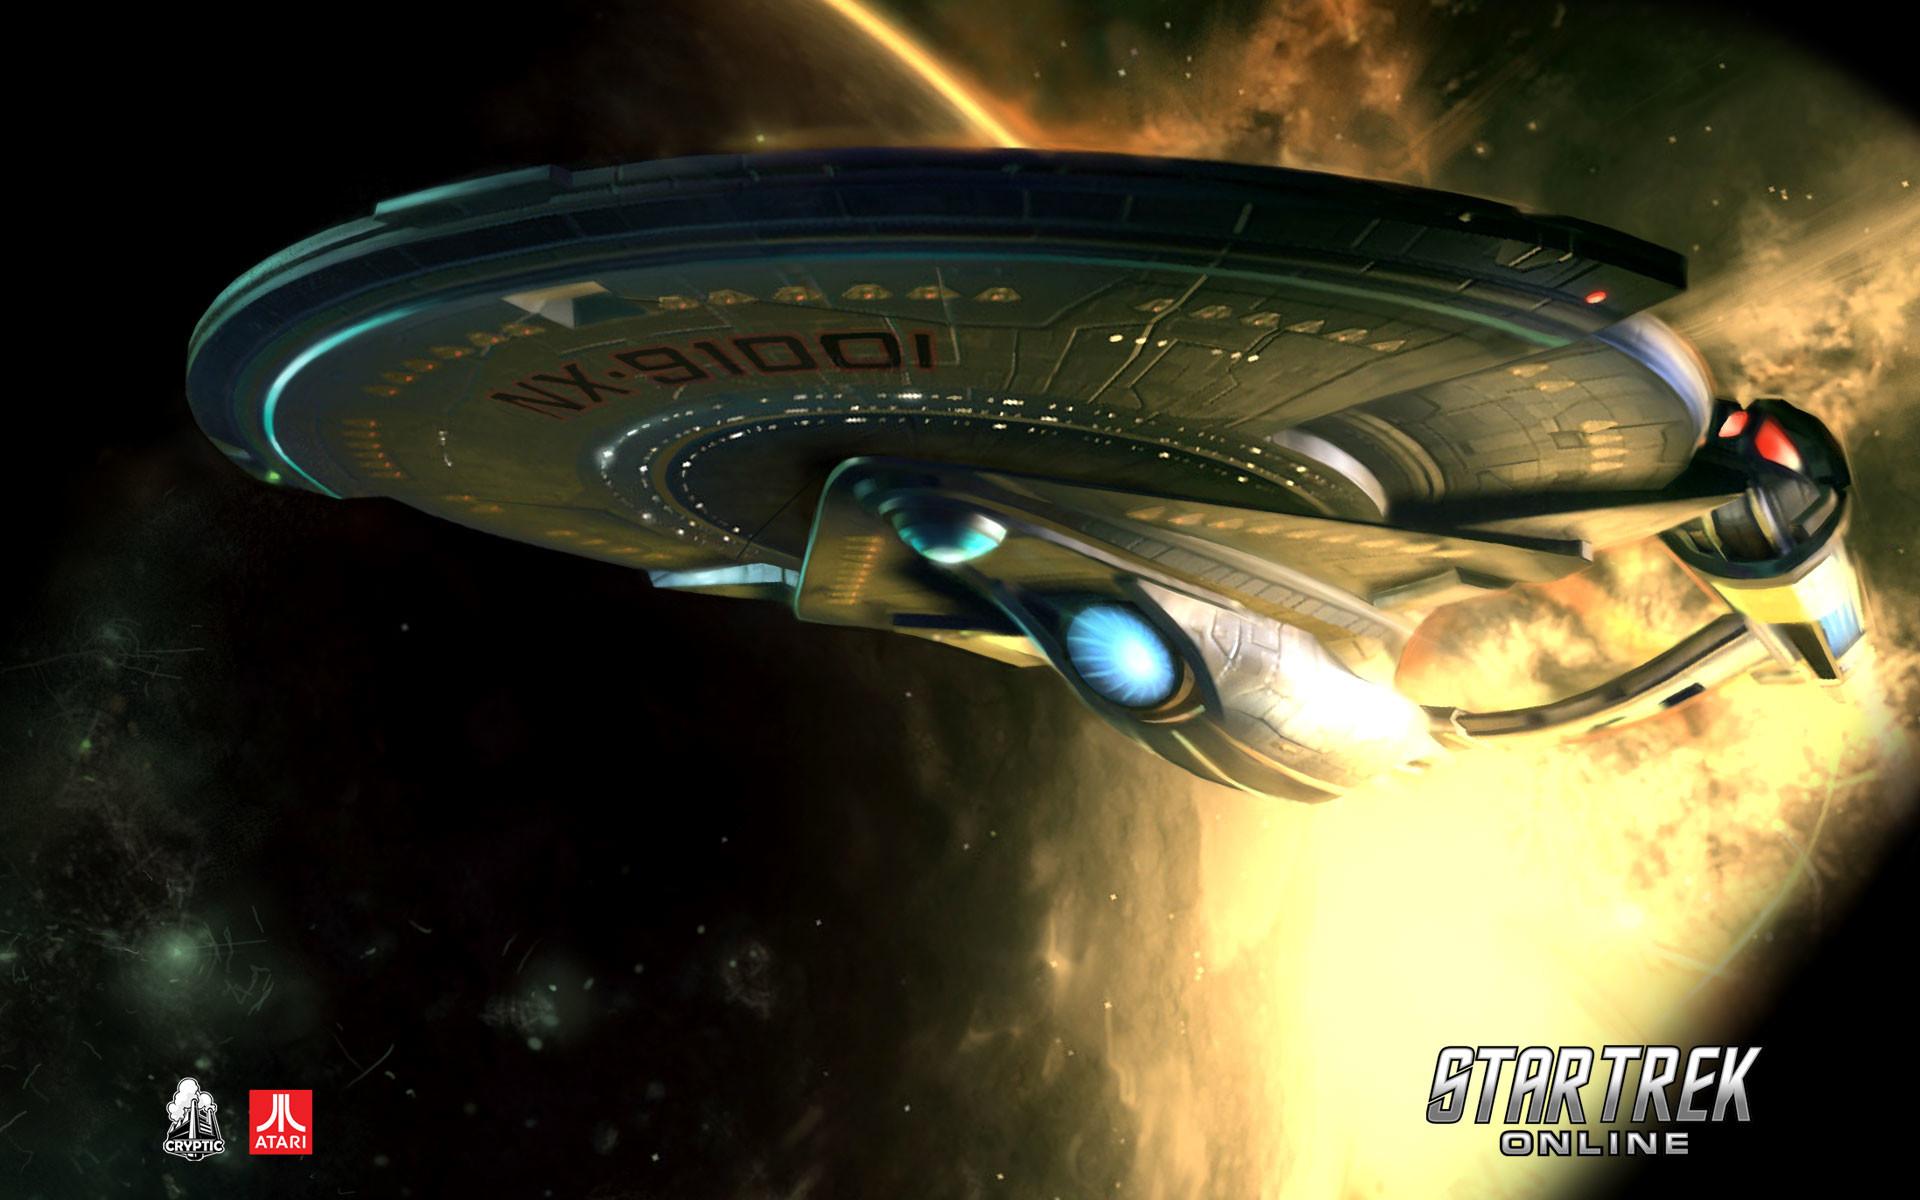 Wallpaper Abyss Everything Star Trek Video Game Star Trek 395704 .